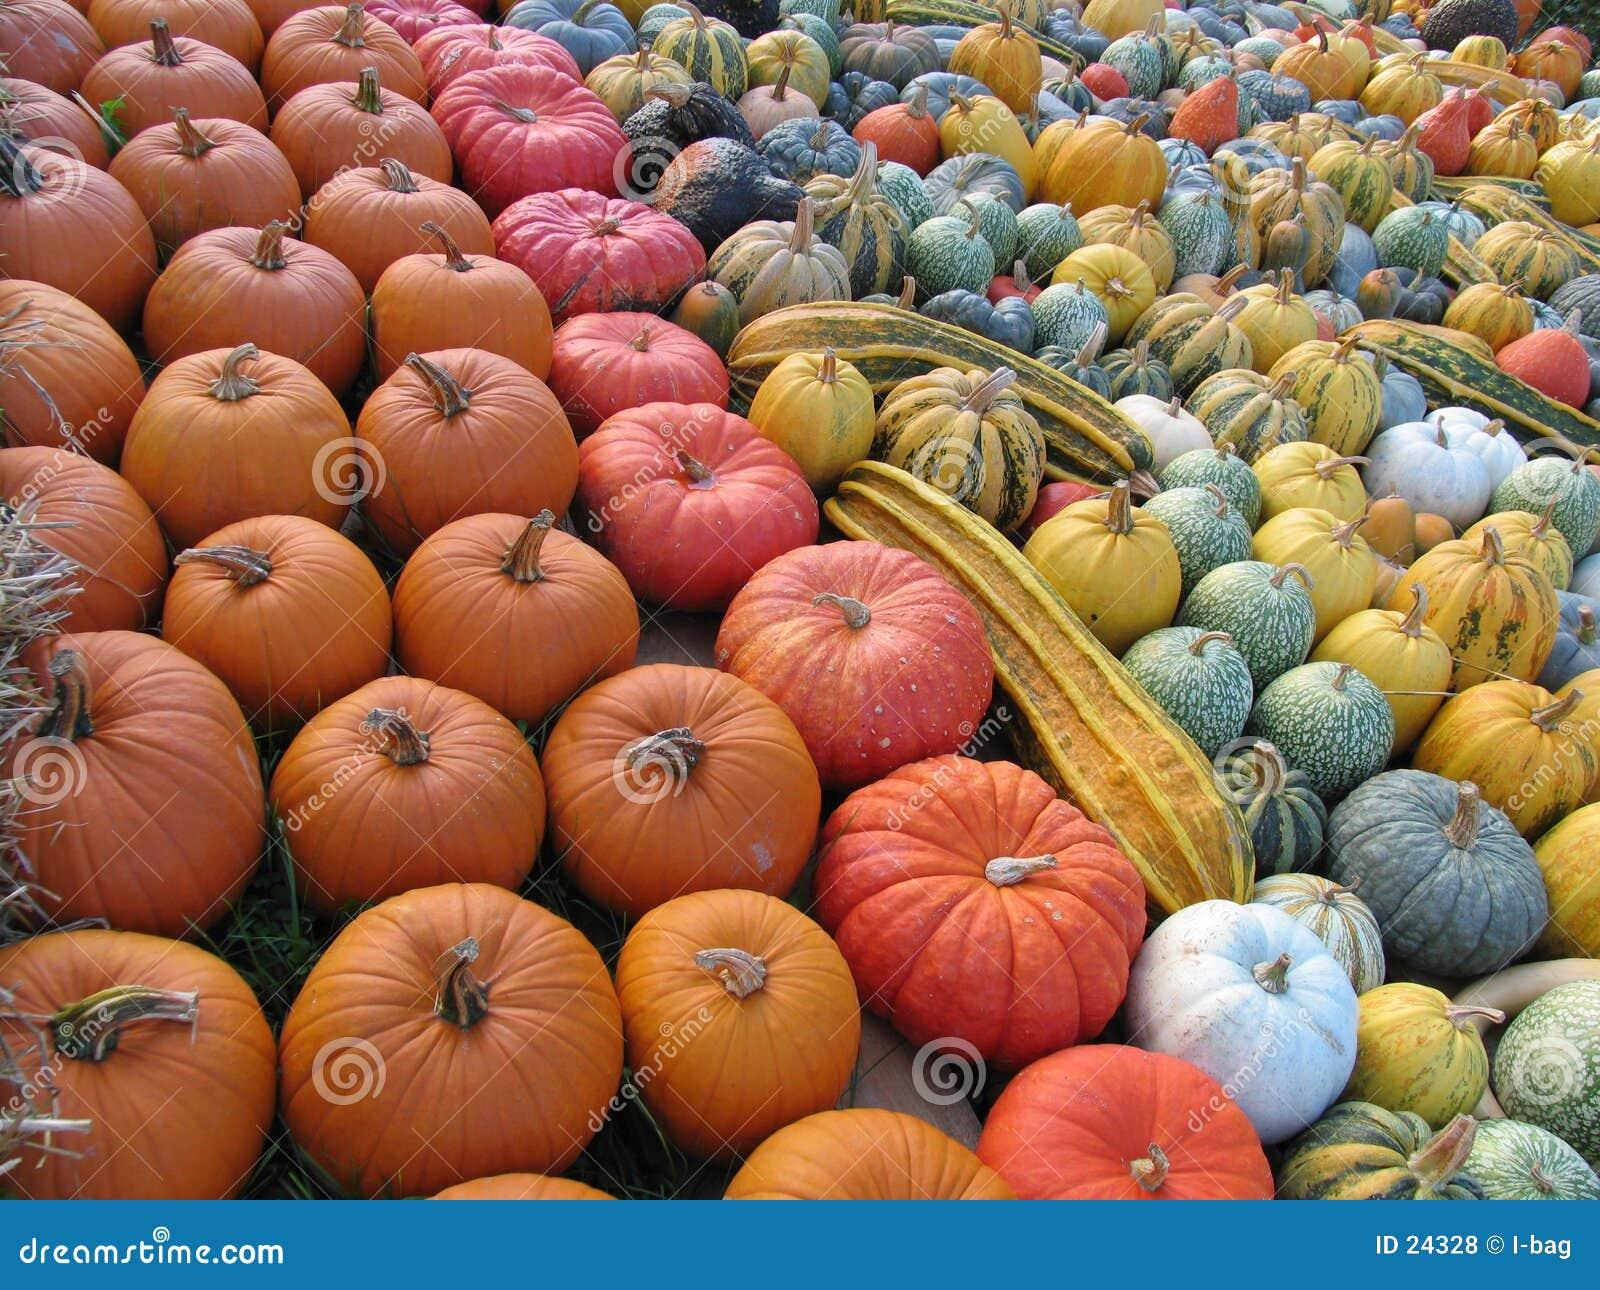 Sea of colorful diversified pumpkins